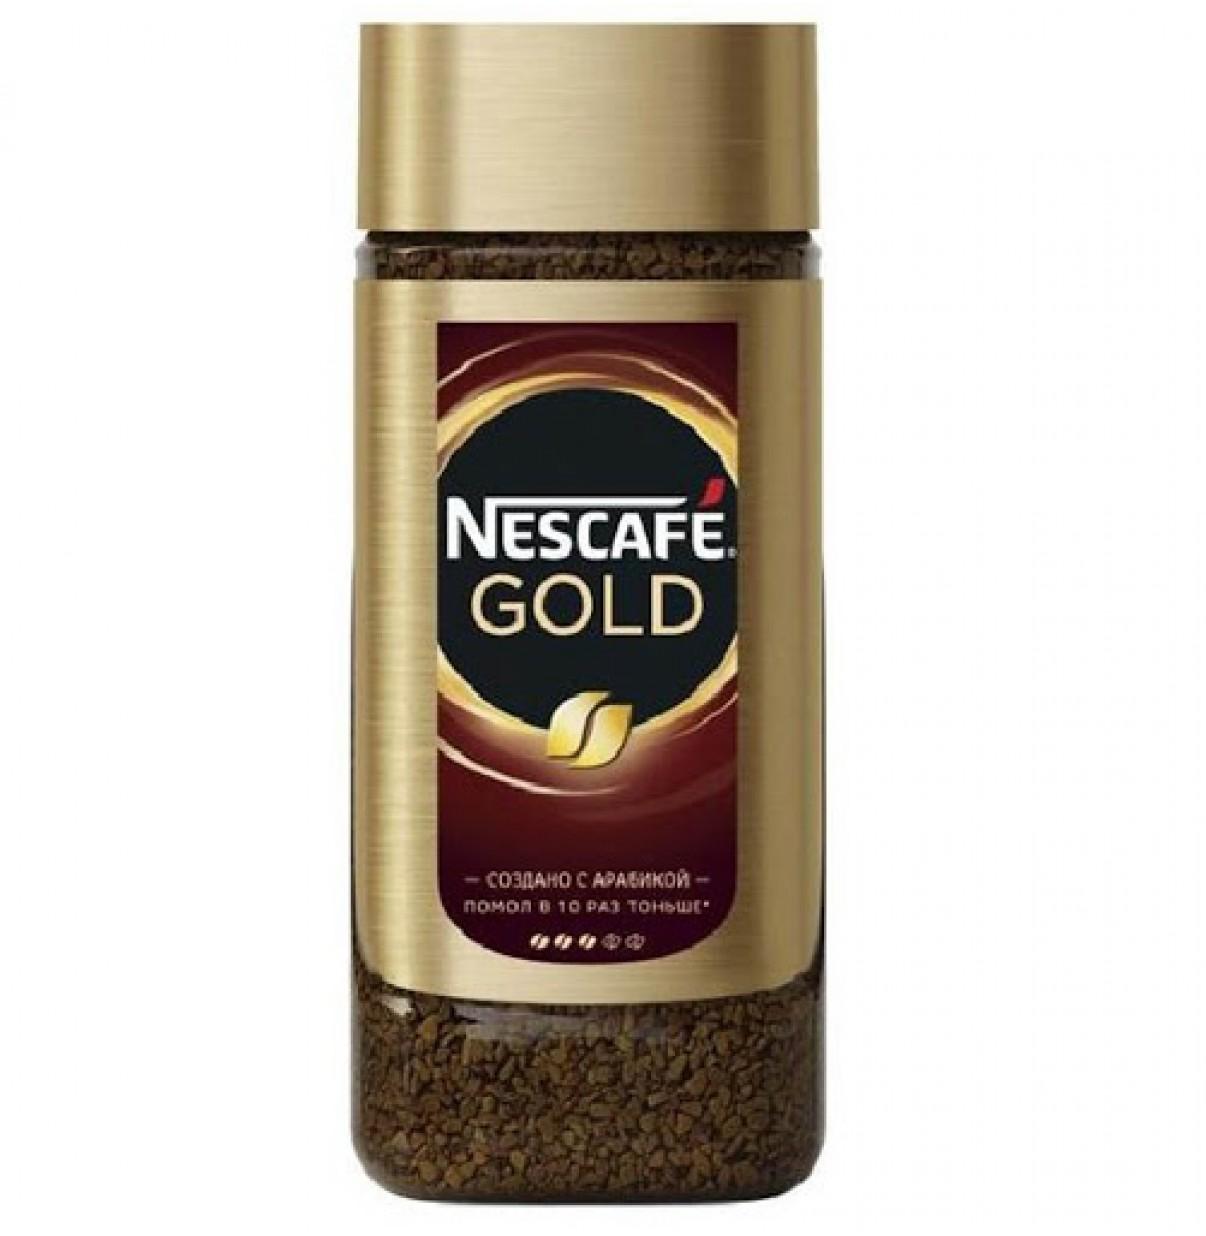 Кофе «Nescafe Gold» стекло 95 г.